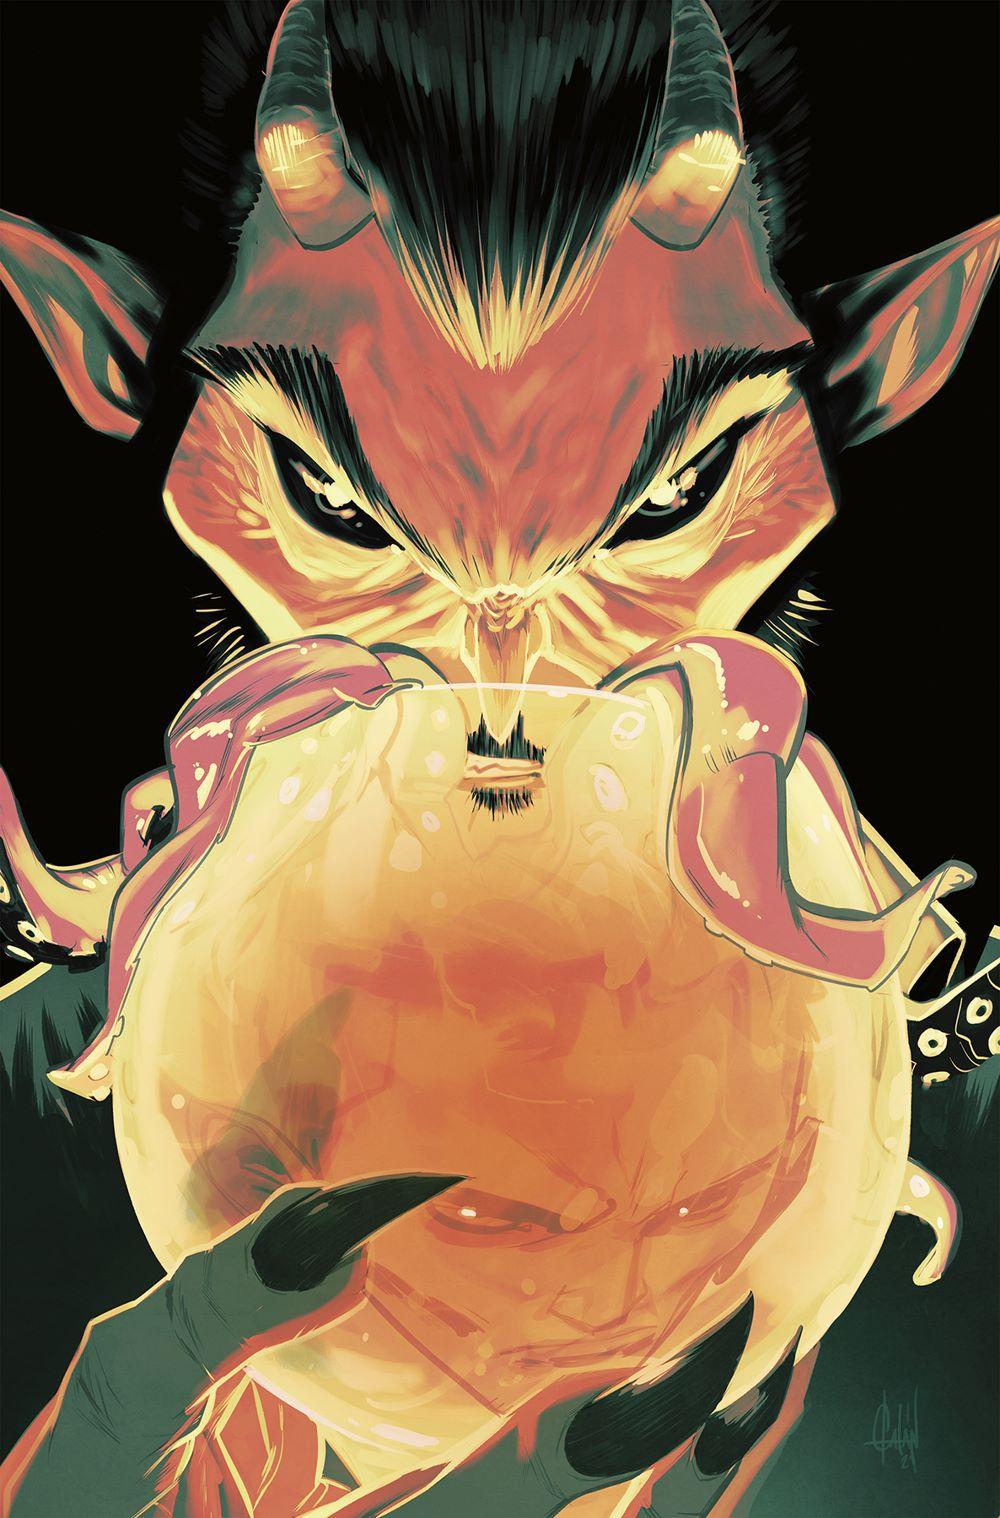 LYDEVIL_i4_FC_VAR_A_FNL_TIPSHEET Dark Horse Comics November 2021 Solicitations